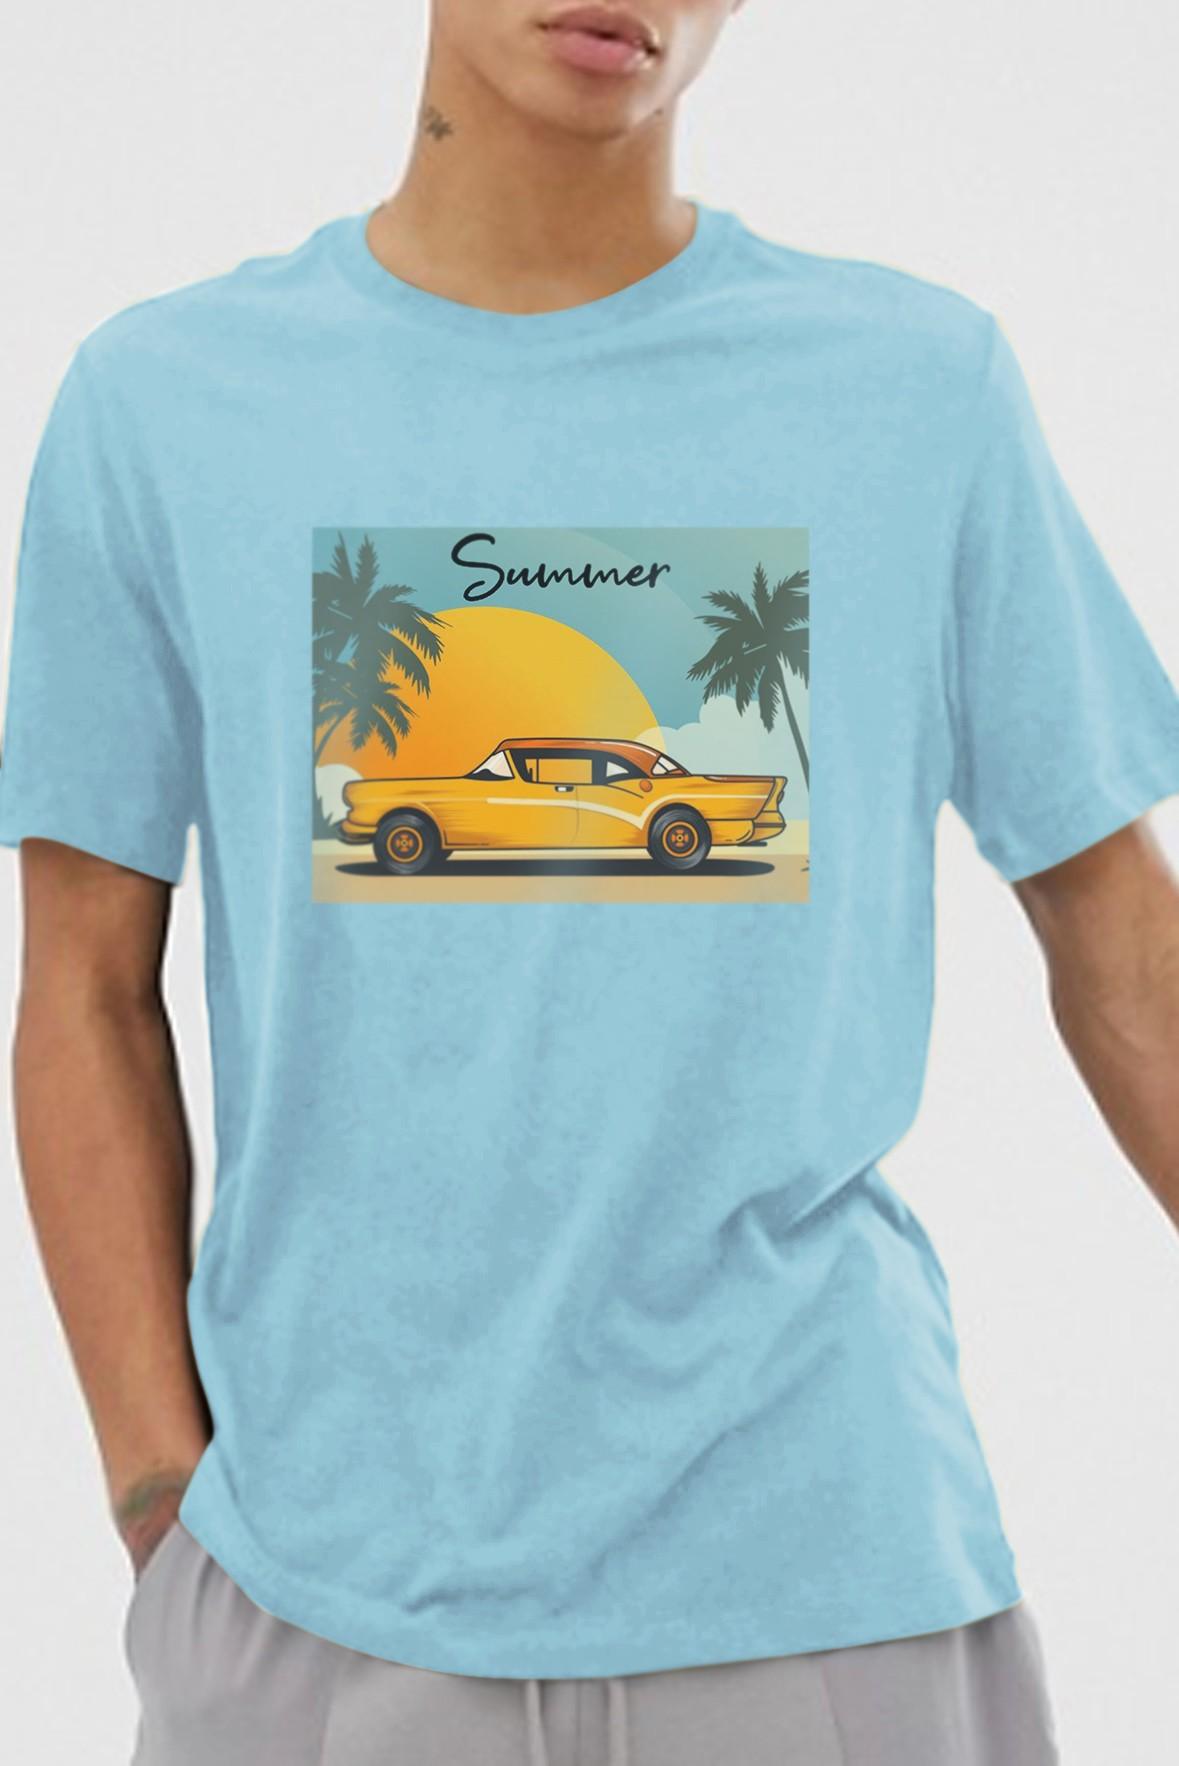 Summer printed t-shirt blue